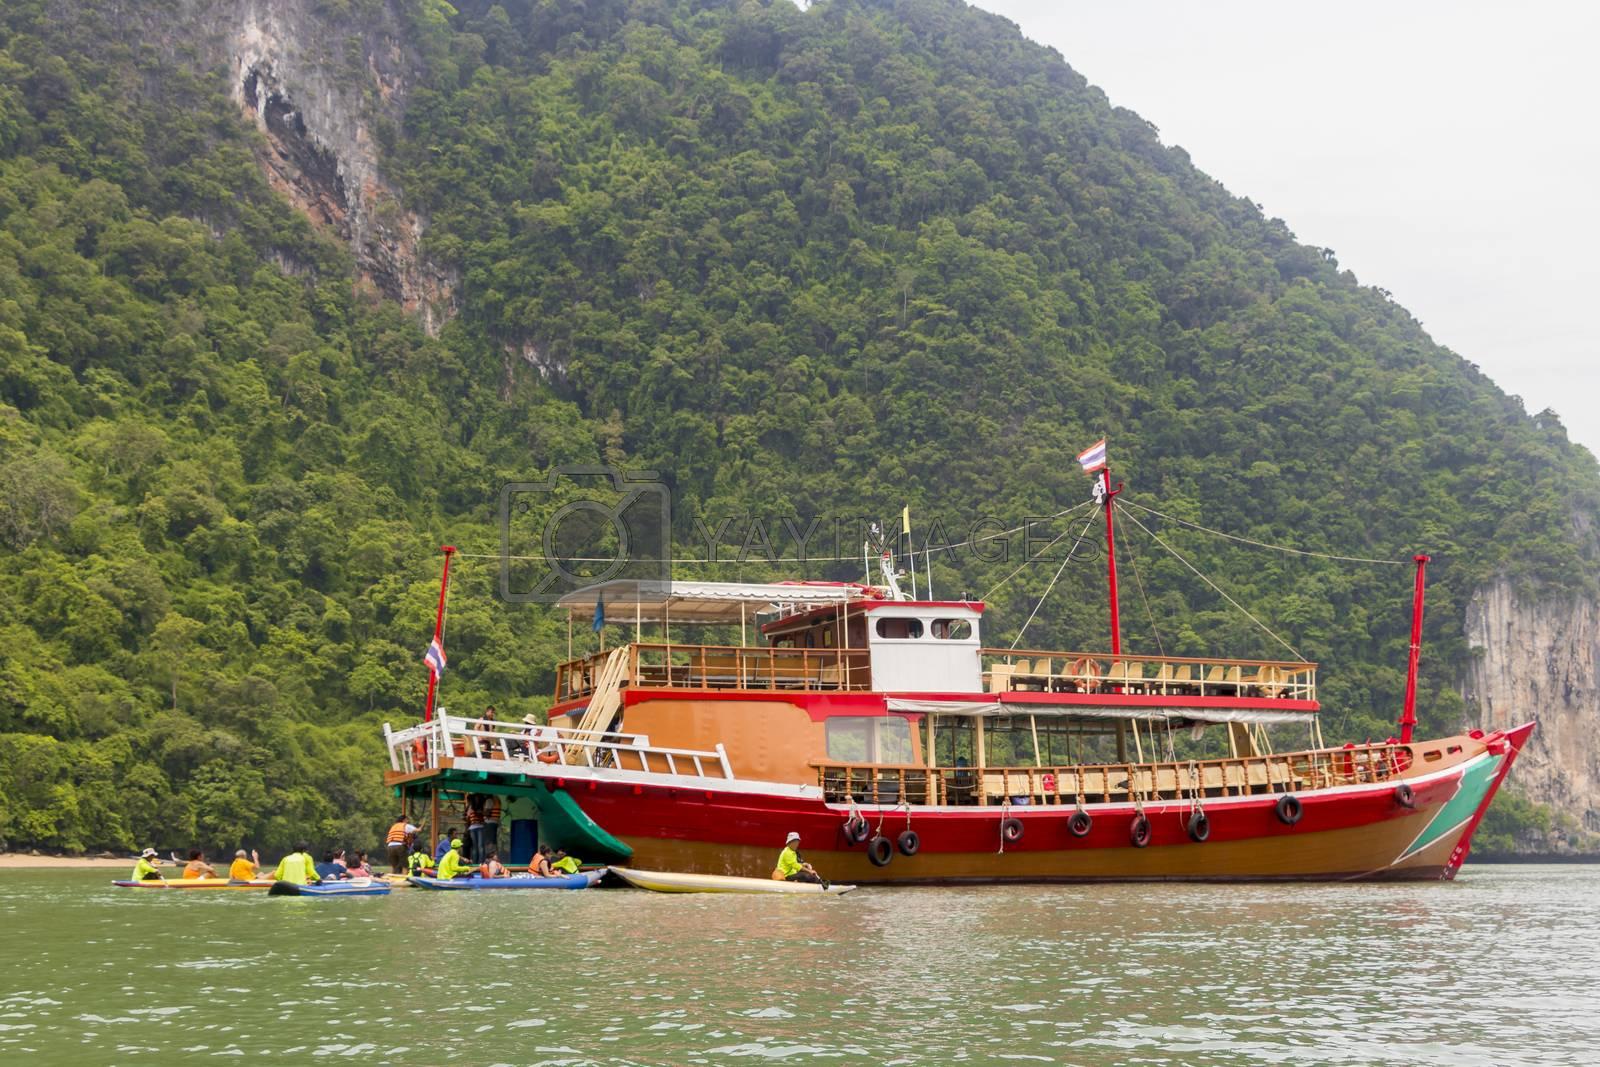 Boat for trip and tourism Ko Hong island in Thailand. Phan Nga Phan-Nga Bay.